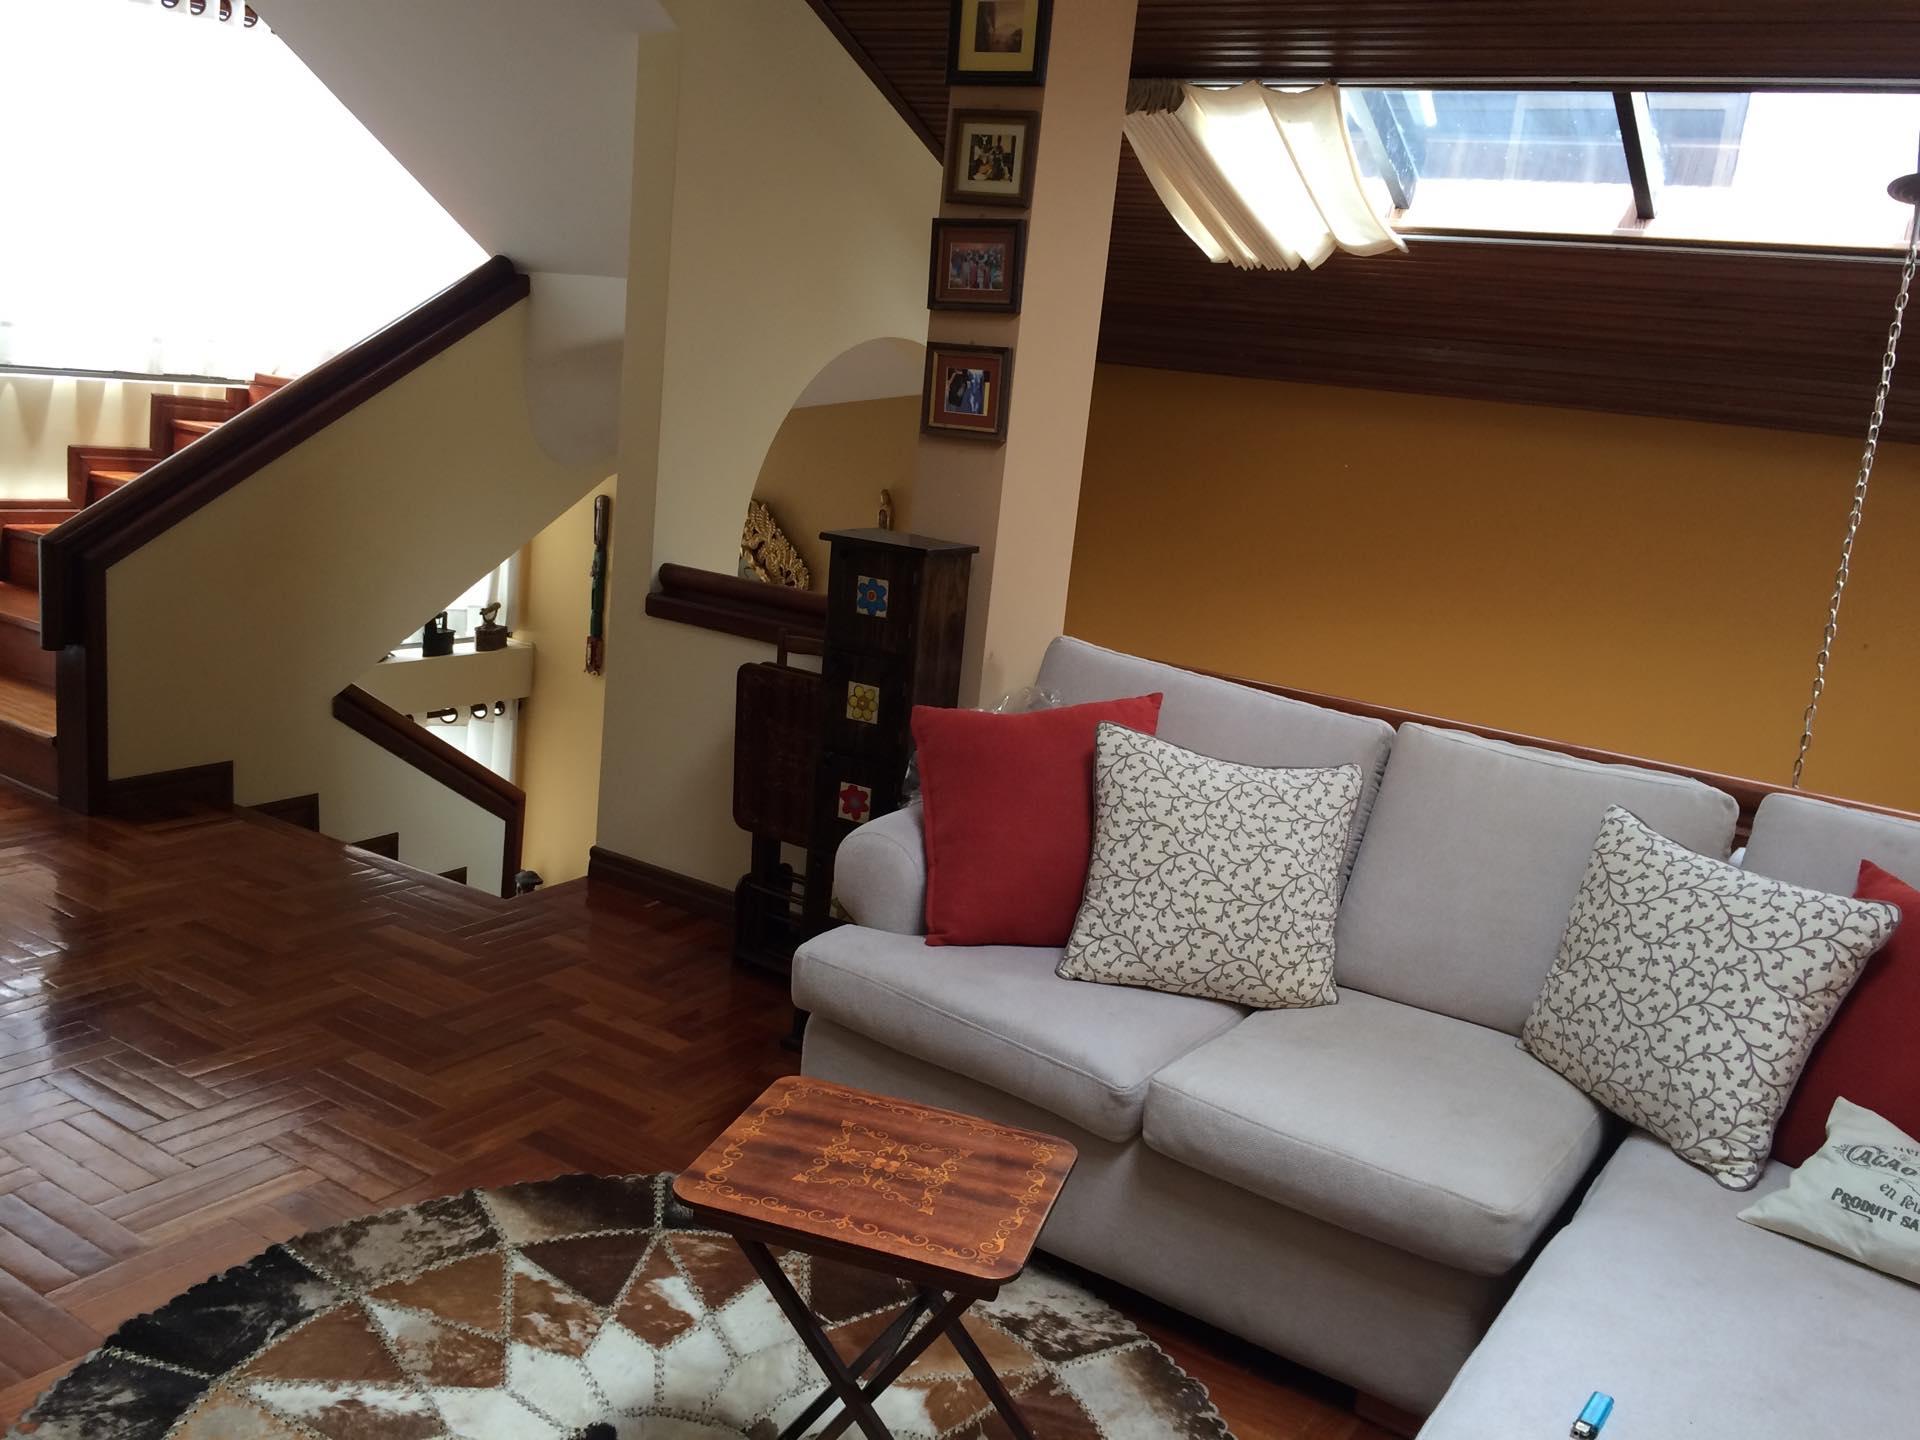 Casa en Venta CASA - ACHUMANI - CERCA CALLE 22 Foto 5